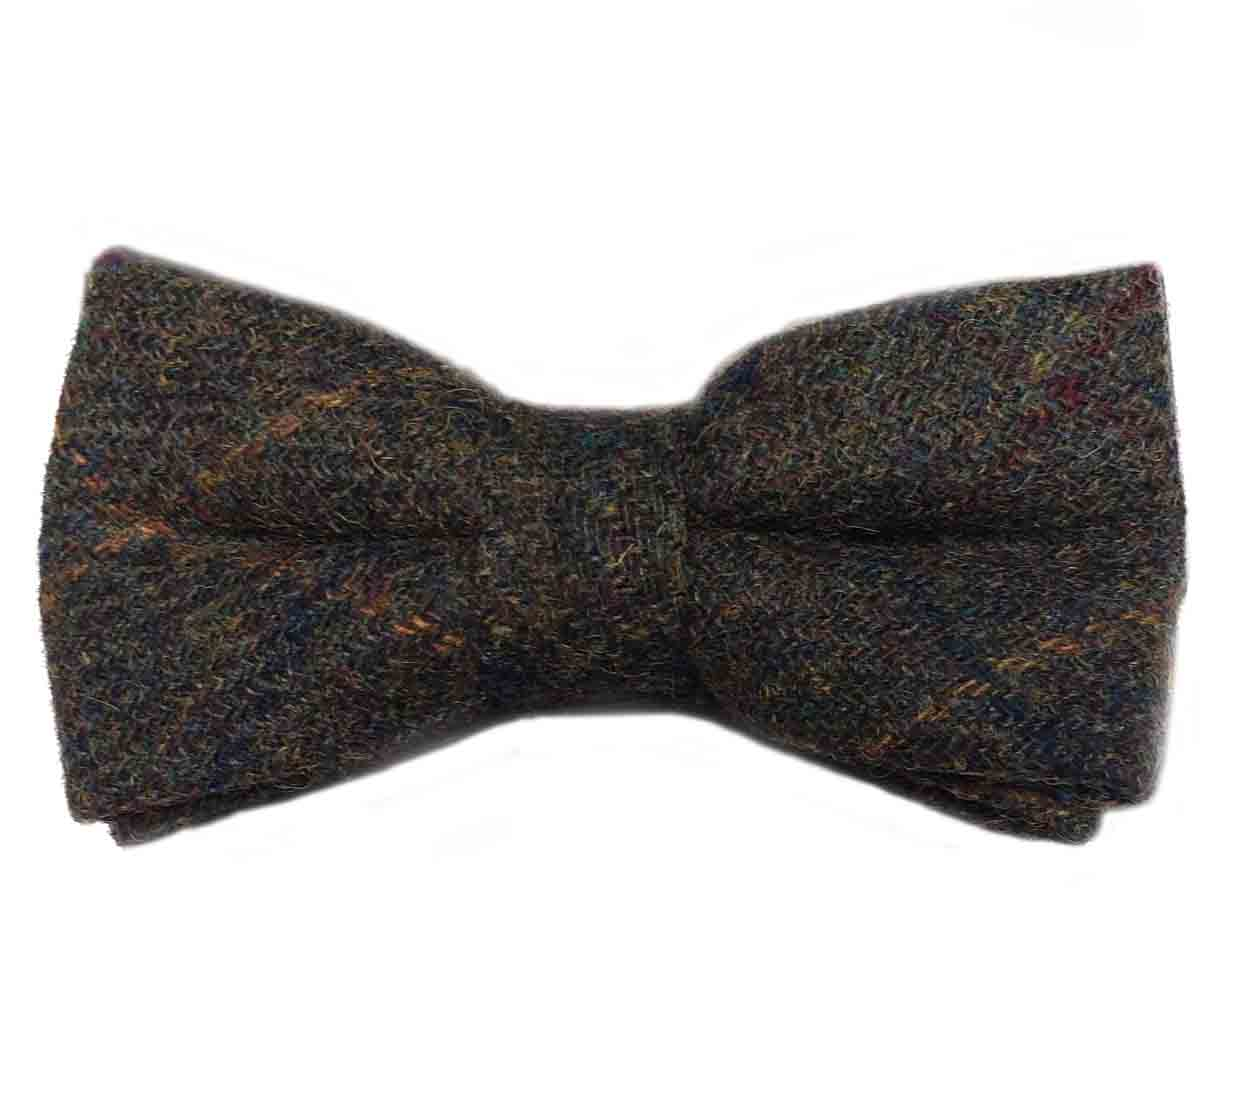 Gascoigne Bow Tie Wool Tweed Olive Green Gold Burgundy Pre-Tied Men's